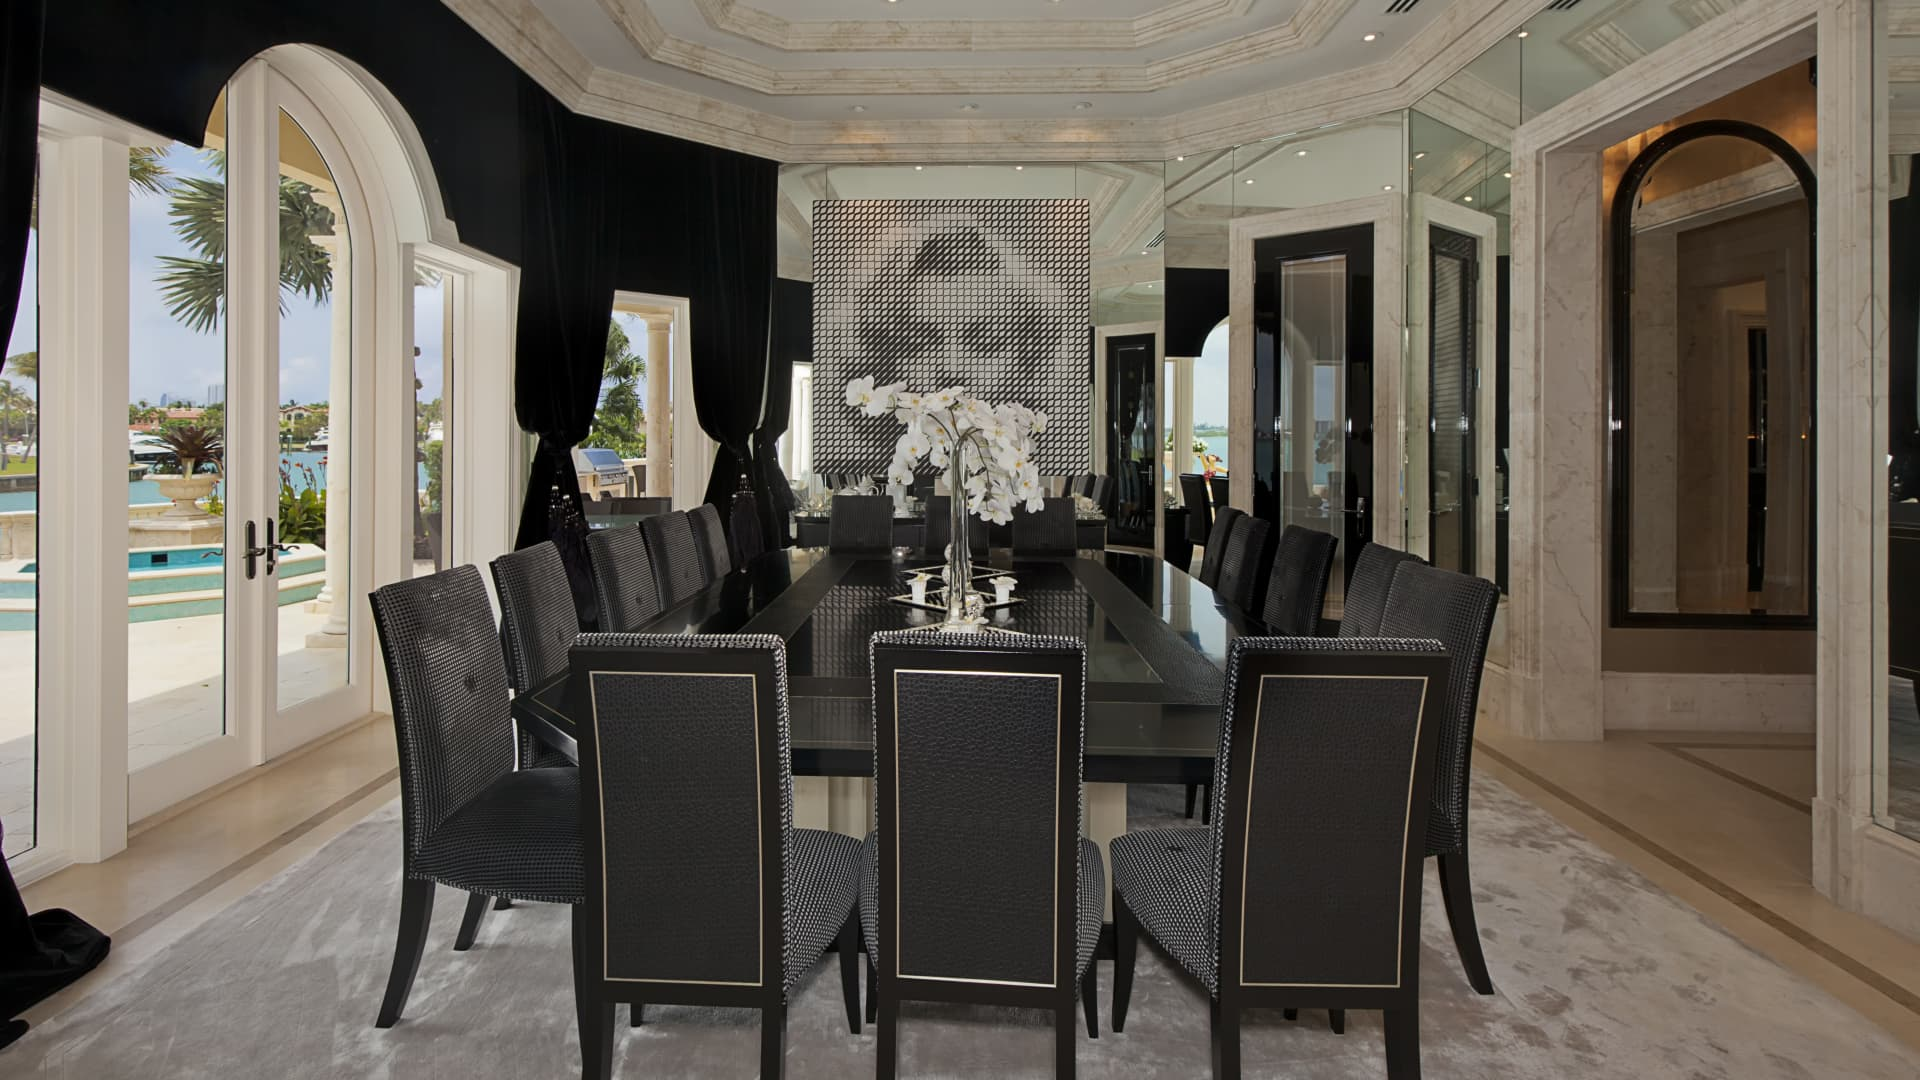 Dining room with Fendi designed furnishings.